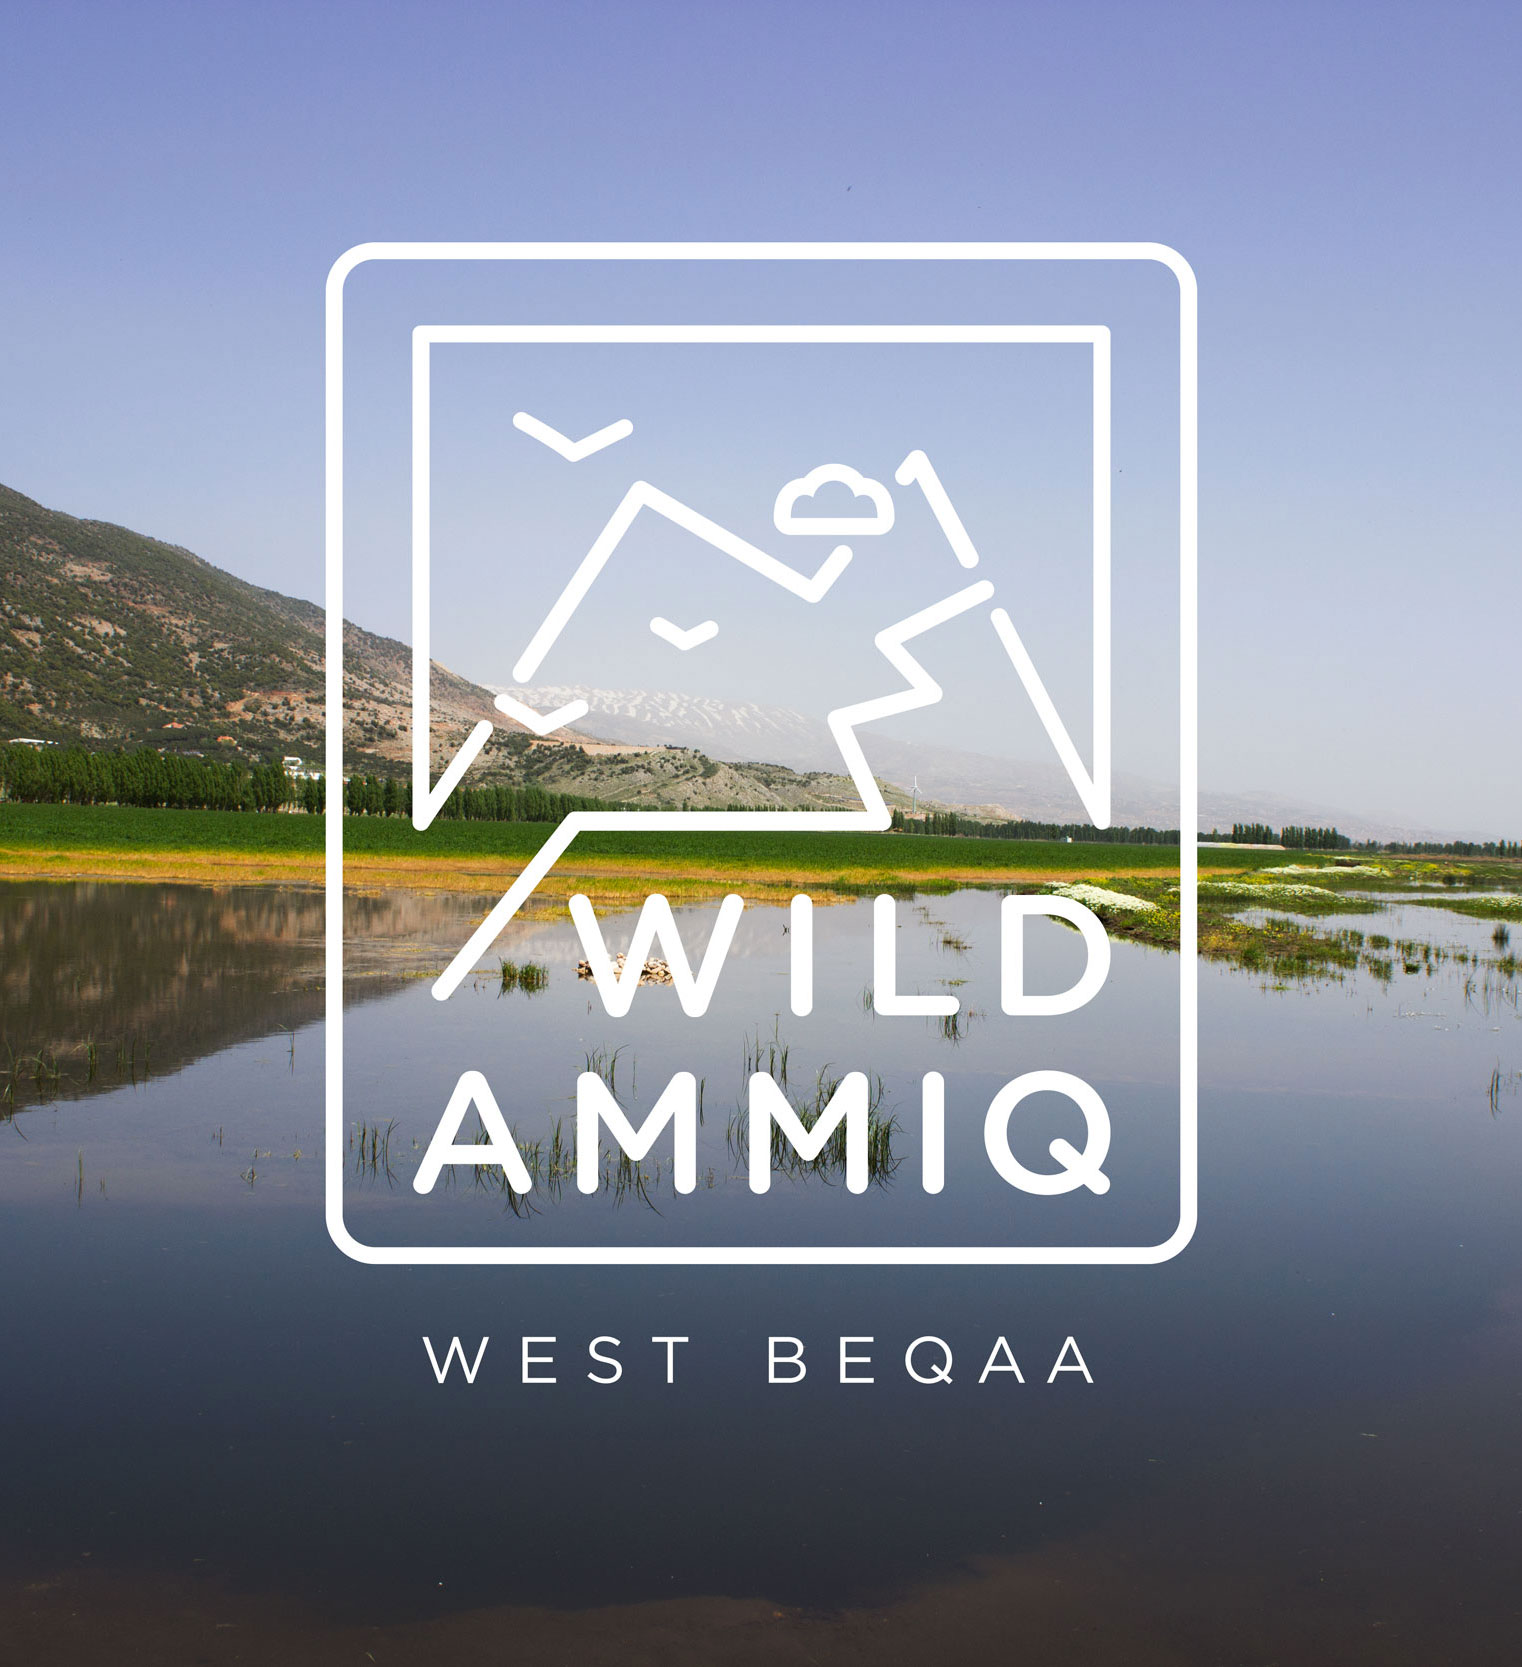 Wild Ammiq